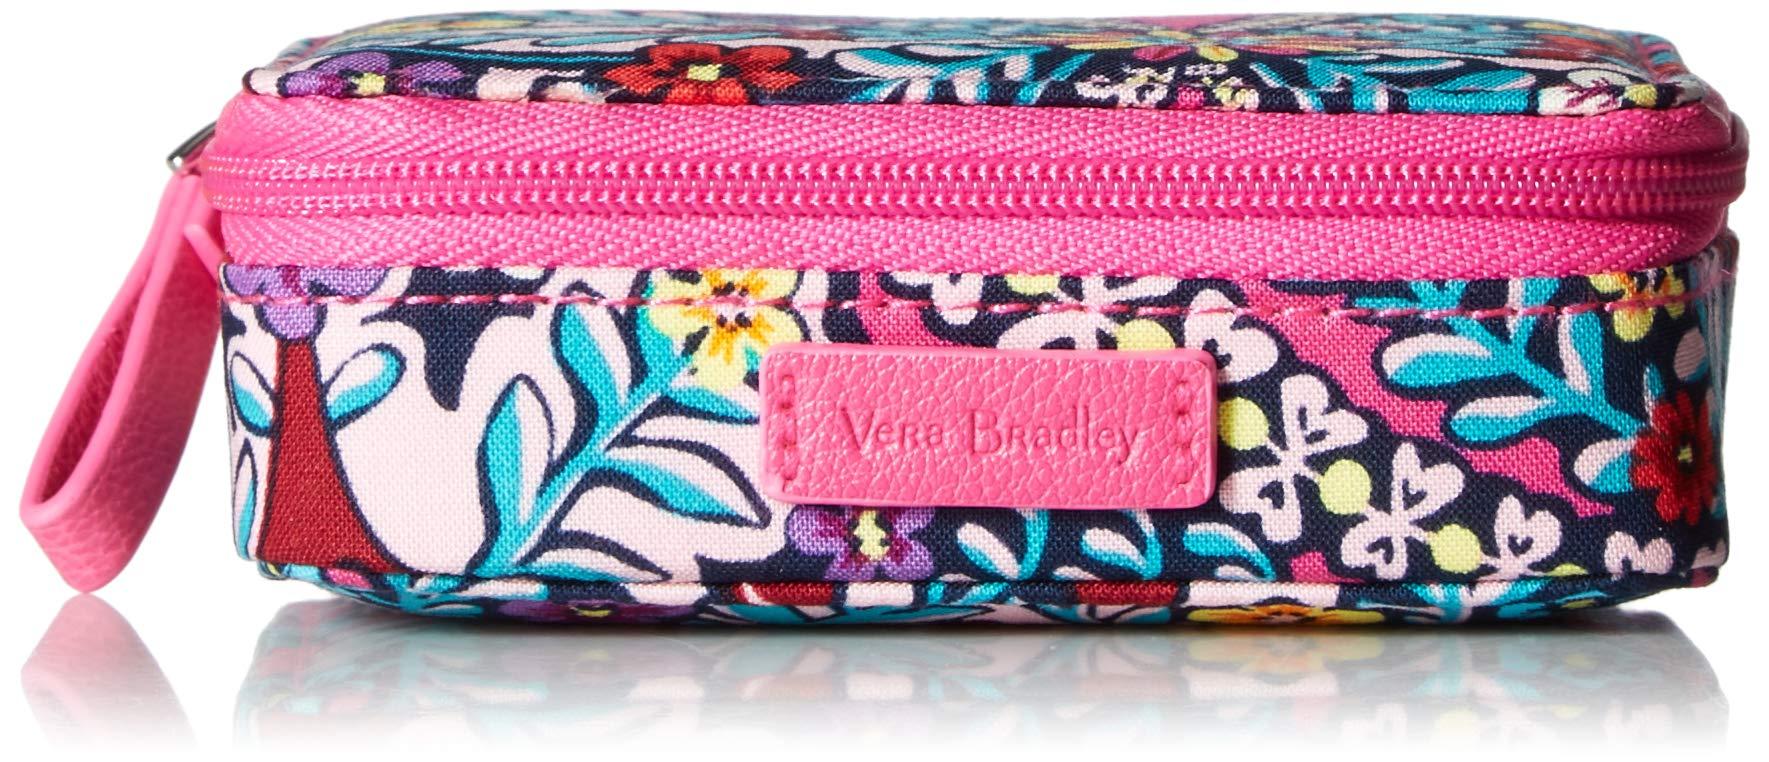 Vera Bradley Iconic Travel Pill Case, Signature Cotton, Kaleidoscope by Vera Bradley